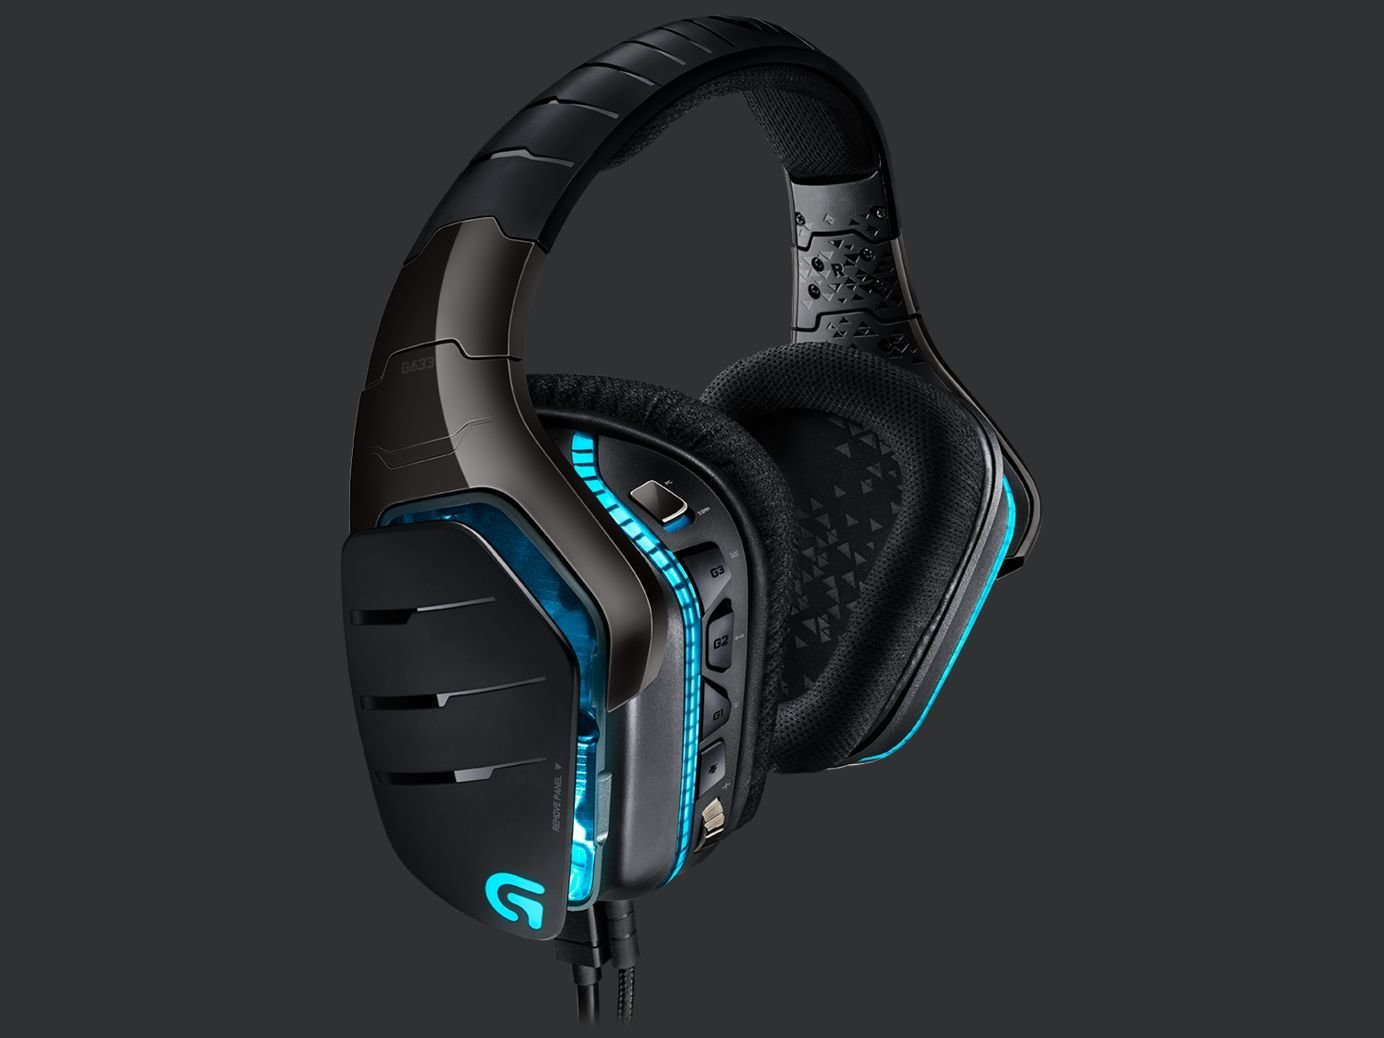 Logitech G633 Artemis Fire Wired Surround Sound Gaming Headset